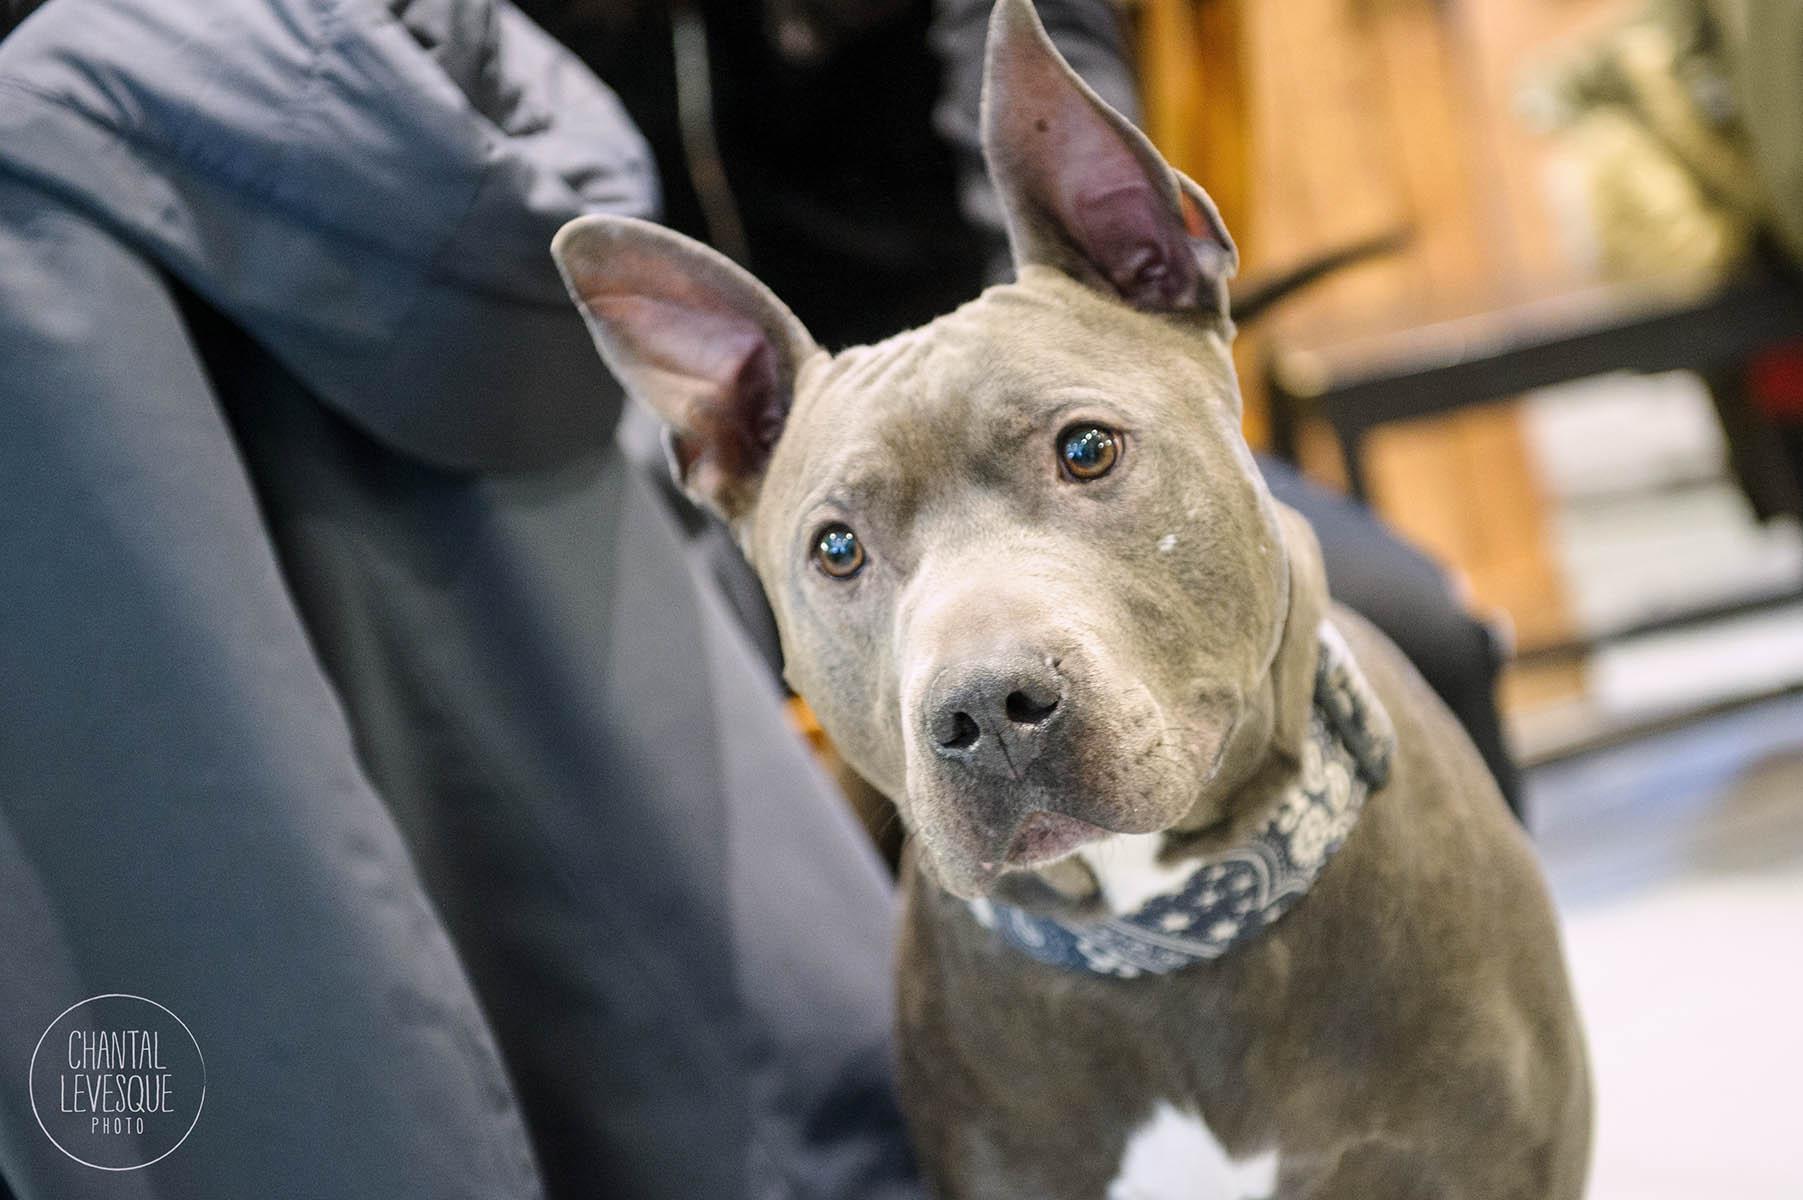 Doggy-casting-pitbulls-4629.jpg